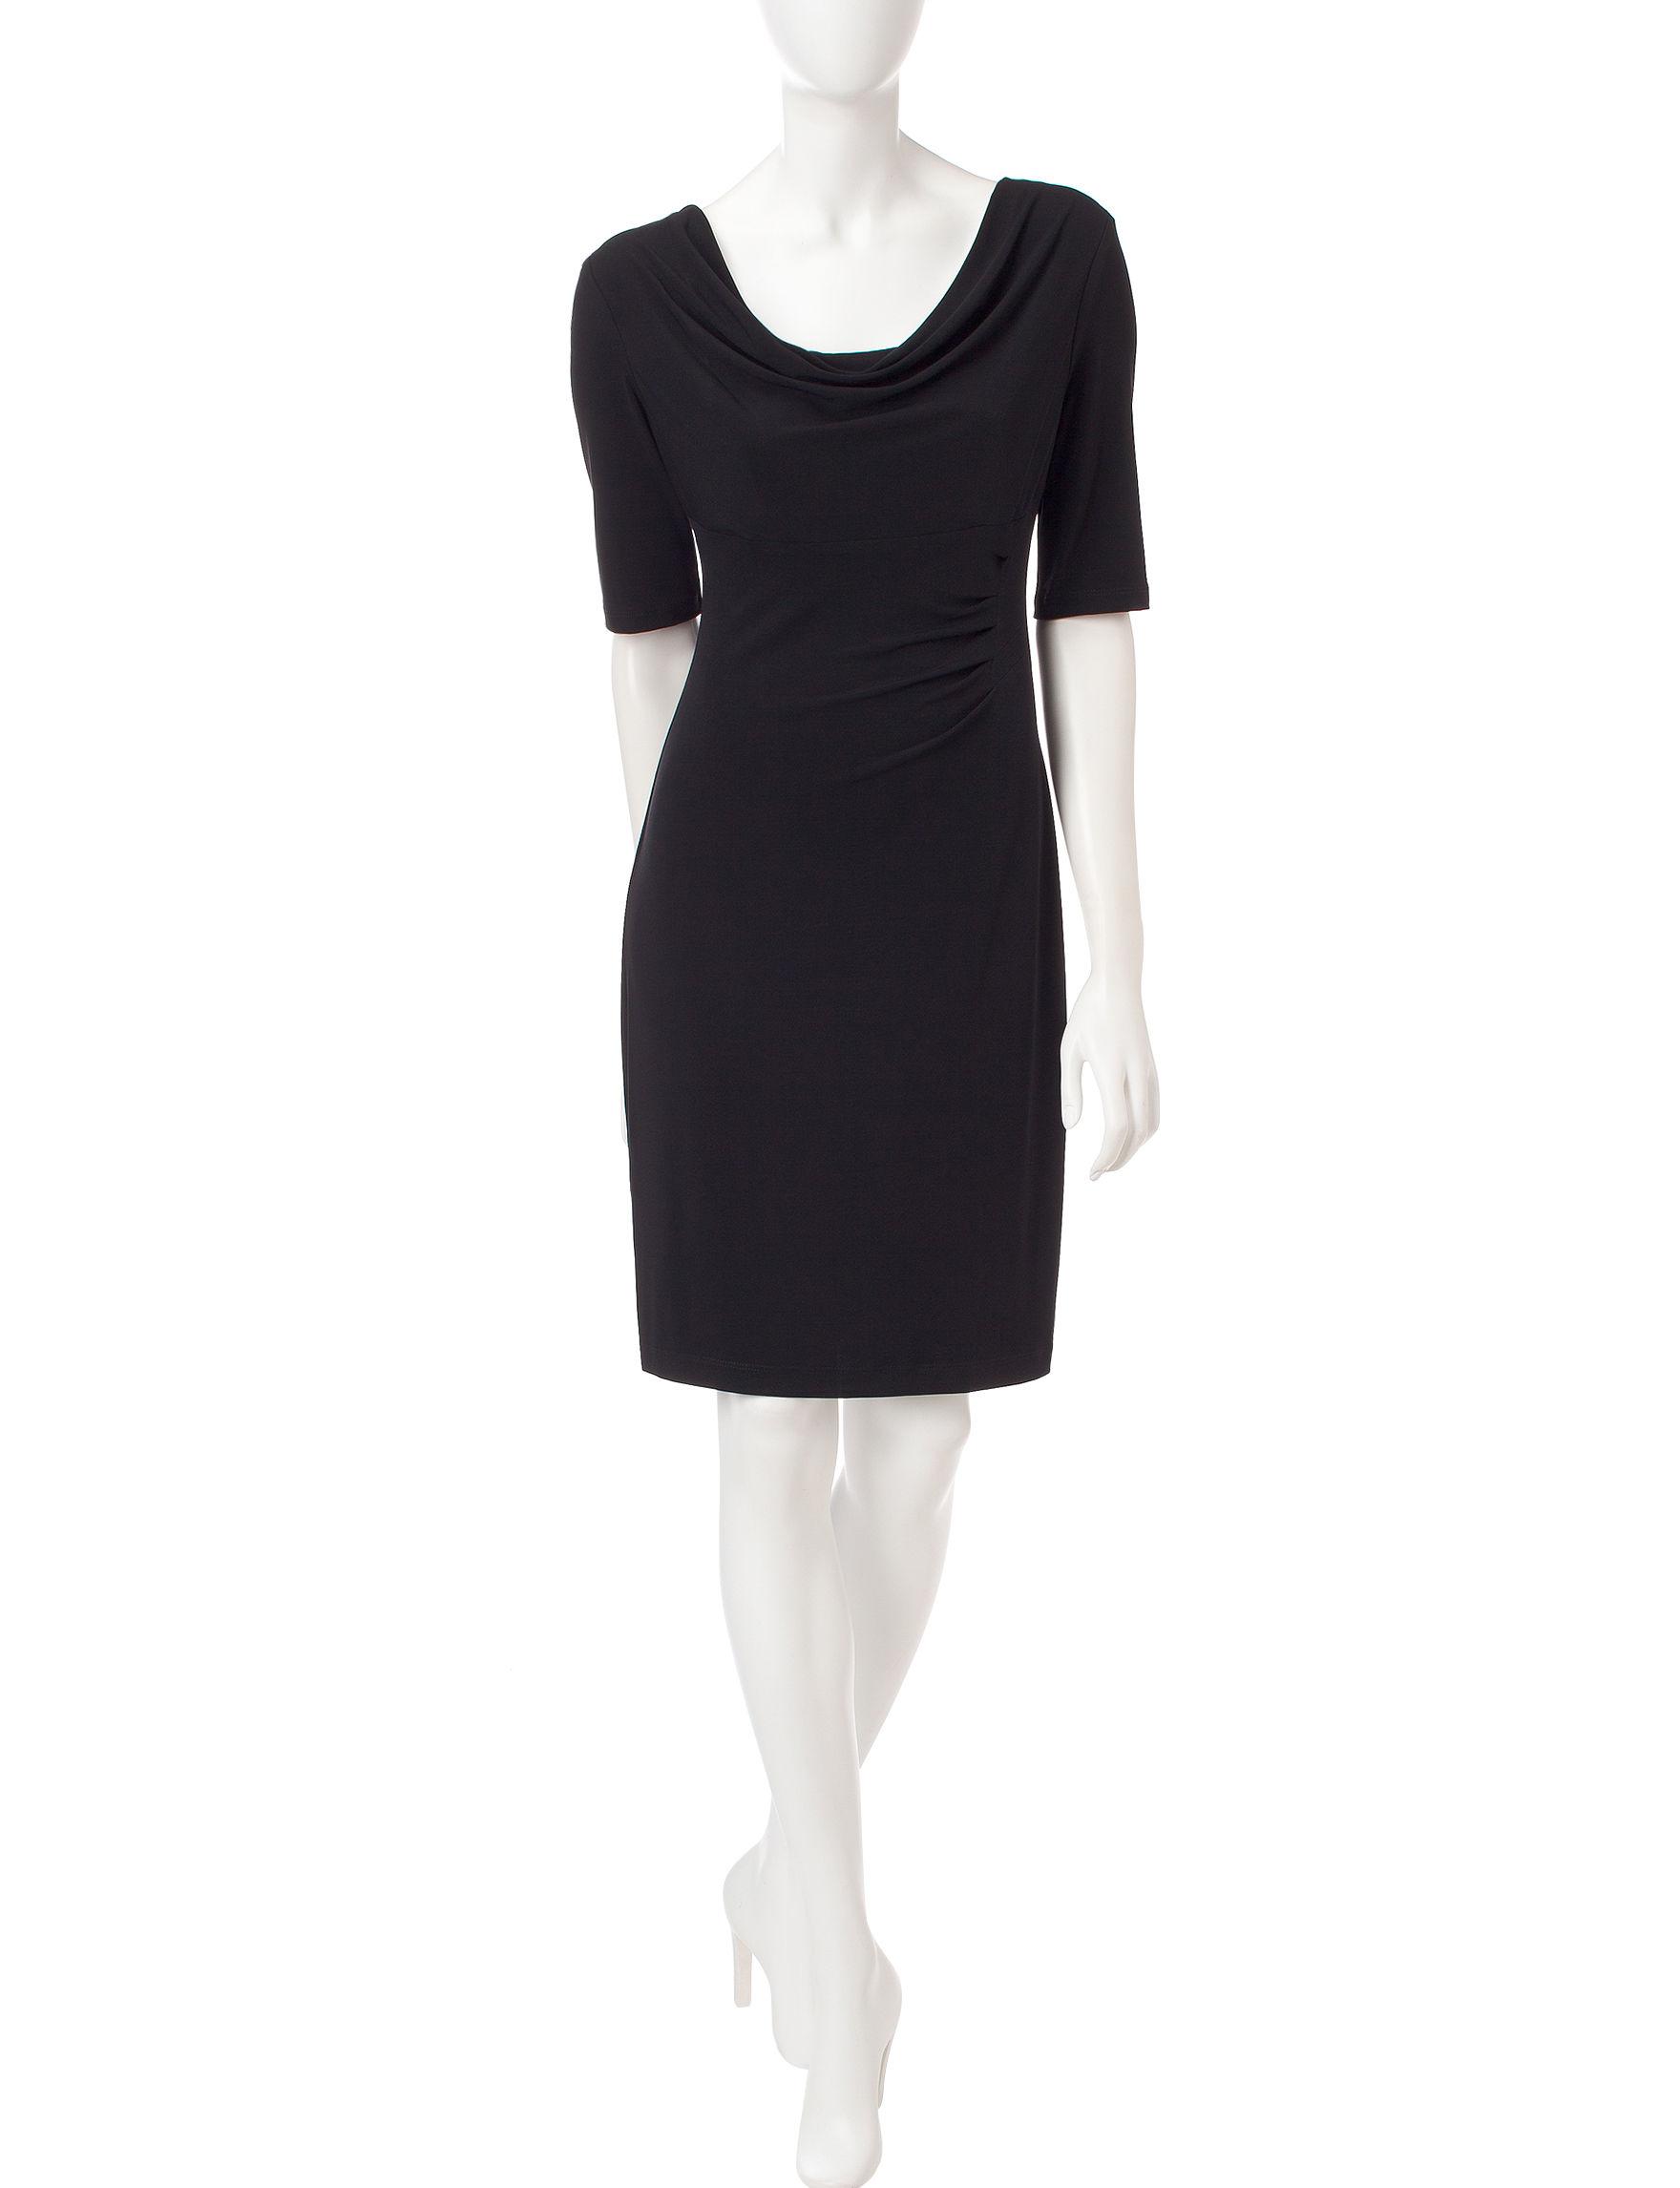 Connected Black Evening & Formal Sheath Dresses